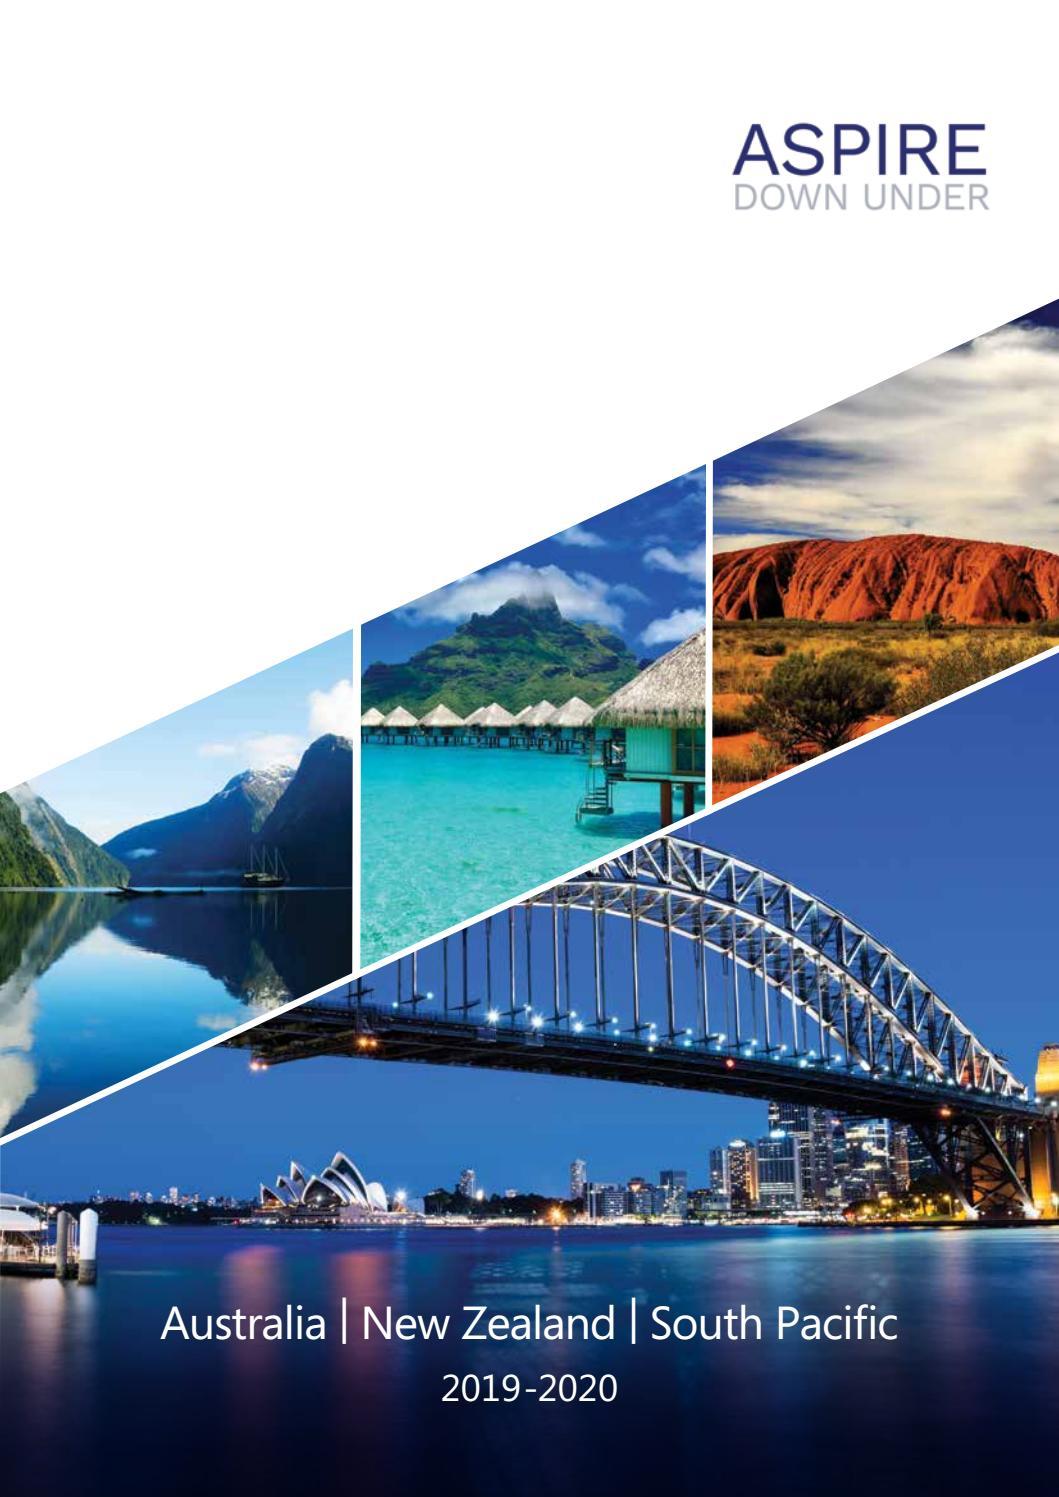 Destination Australia Nz 2019 2020 Aspire By Koolivoo Issuu